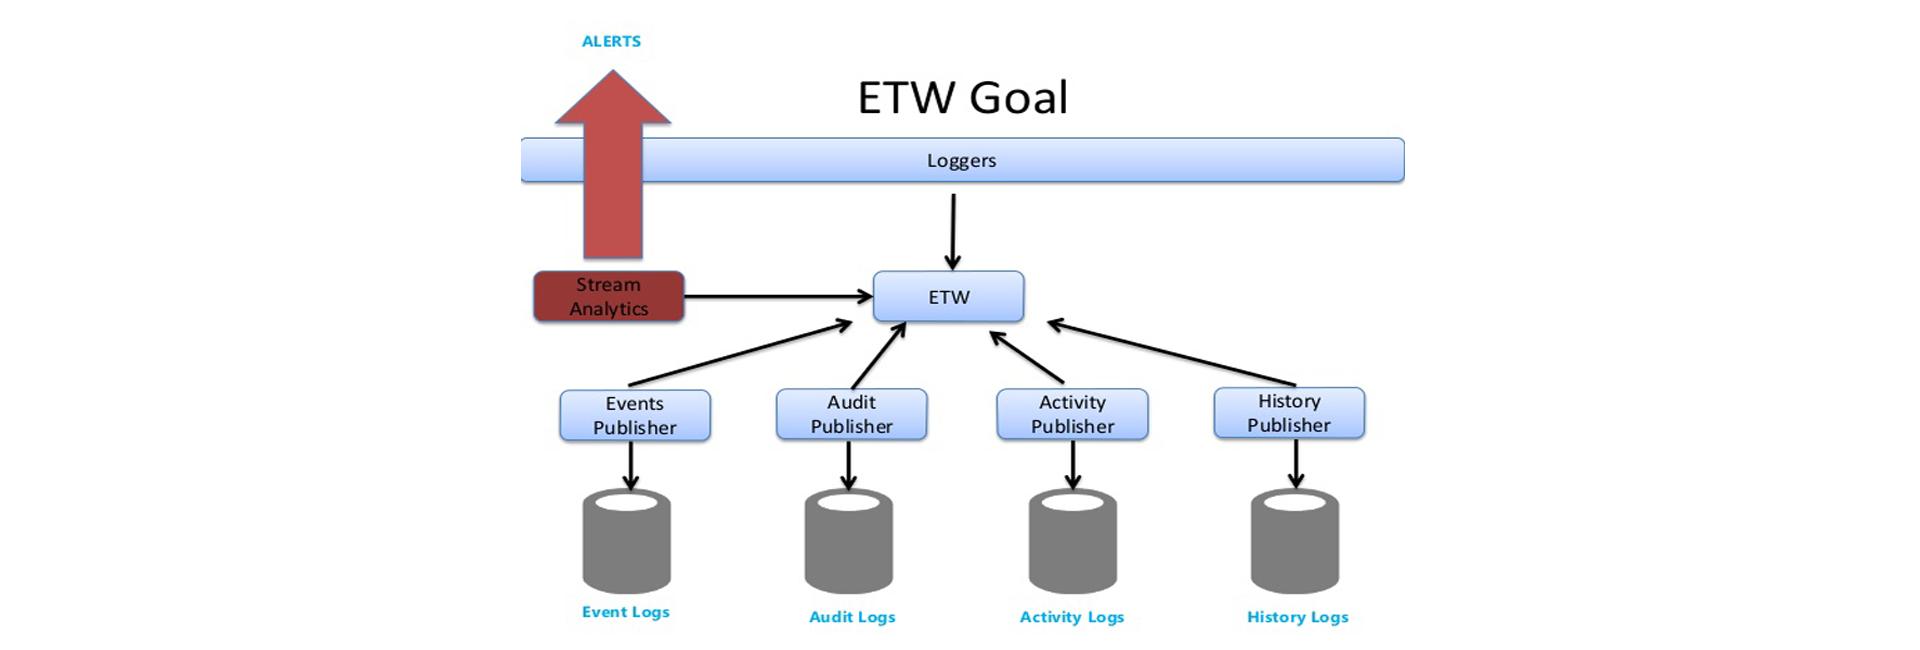 Efficient structured event logging